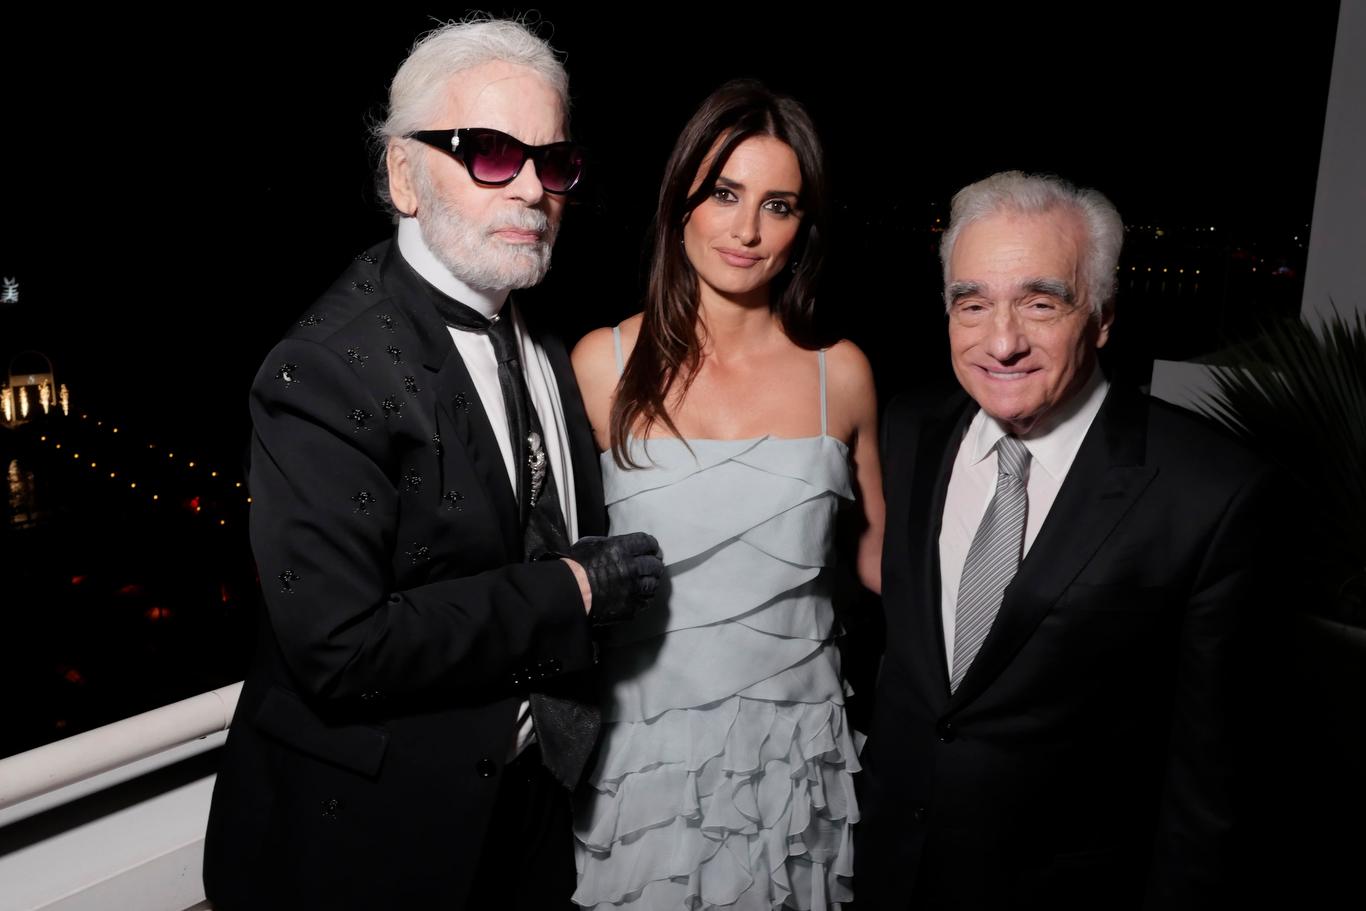 Karl Lagerfeld, Penelope Cruz and Martin Scorsese